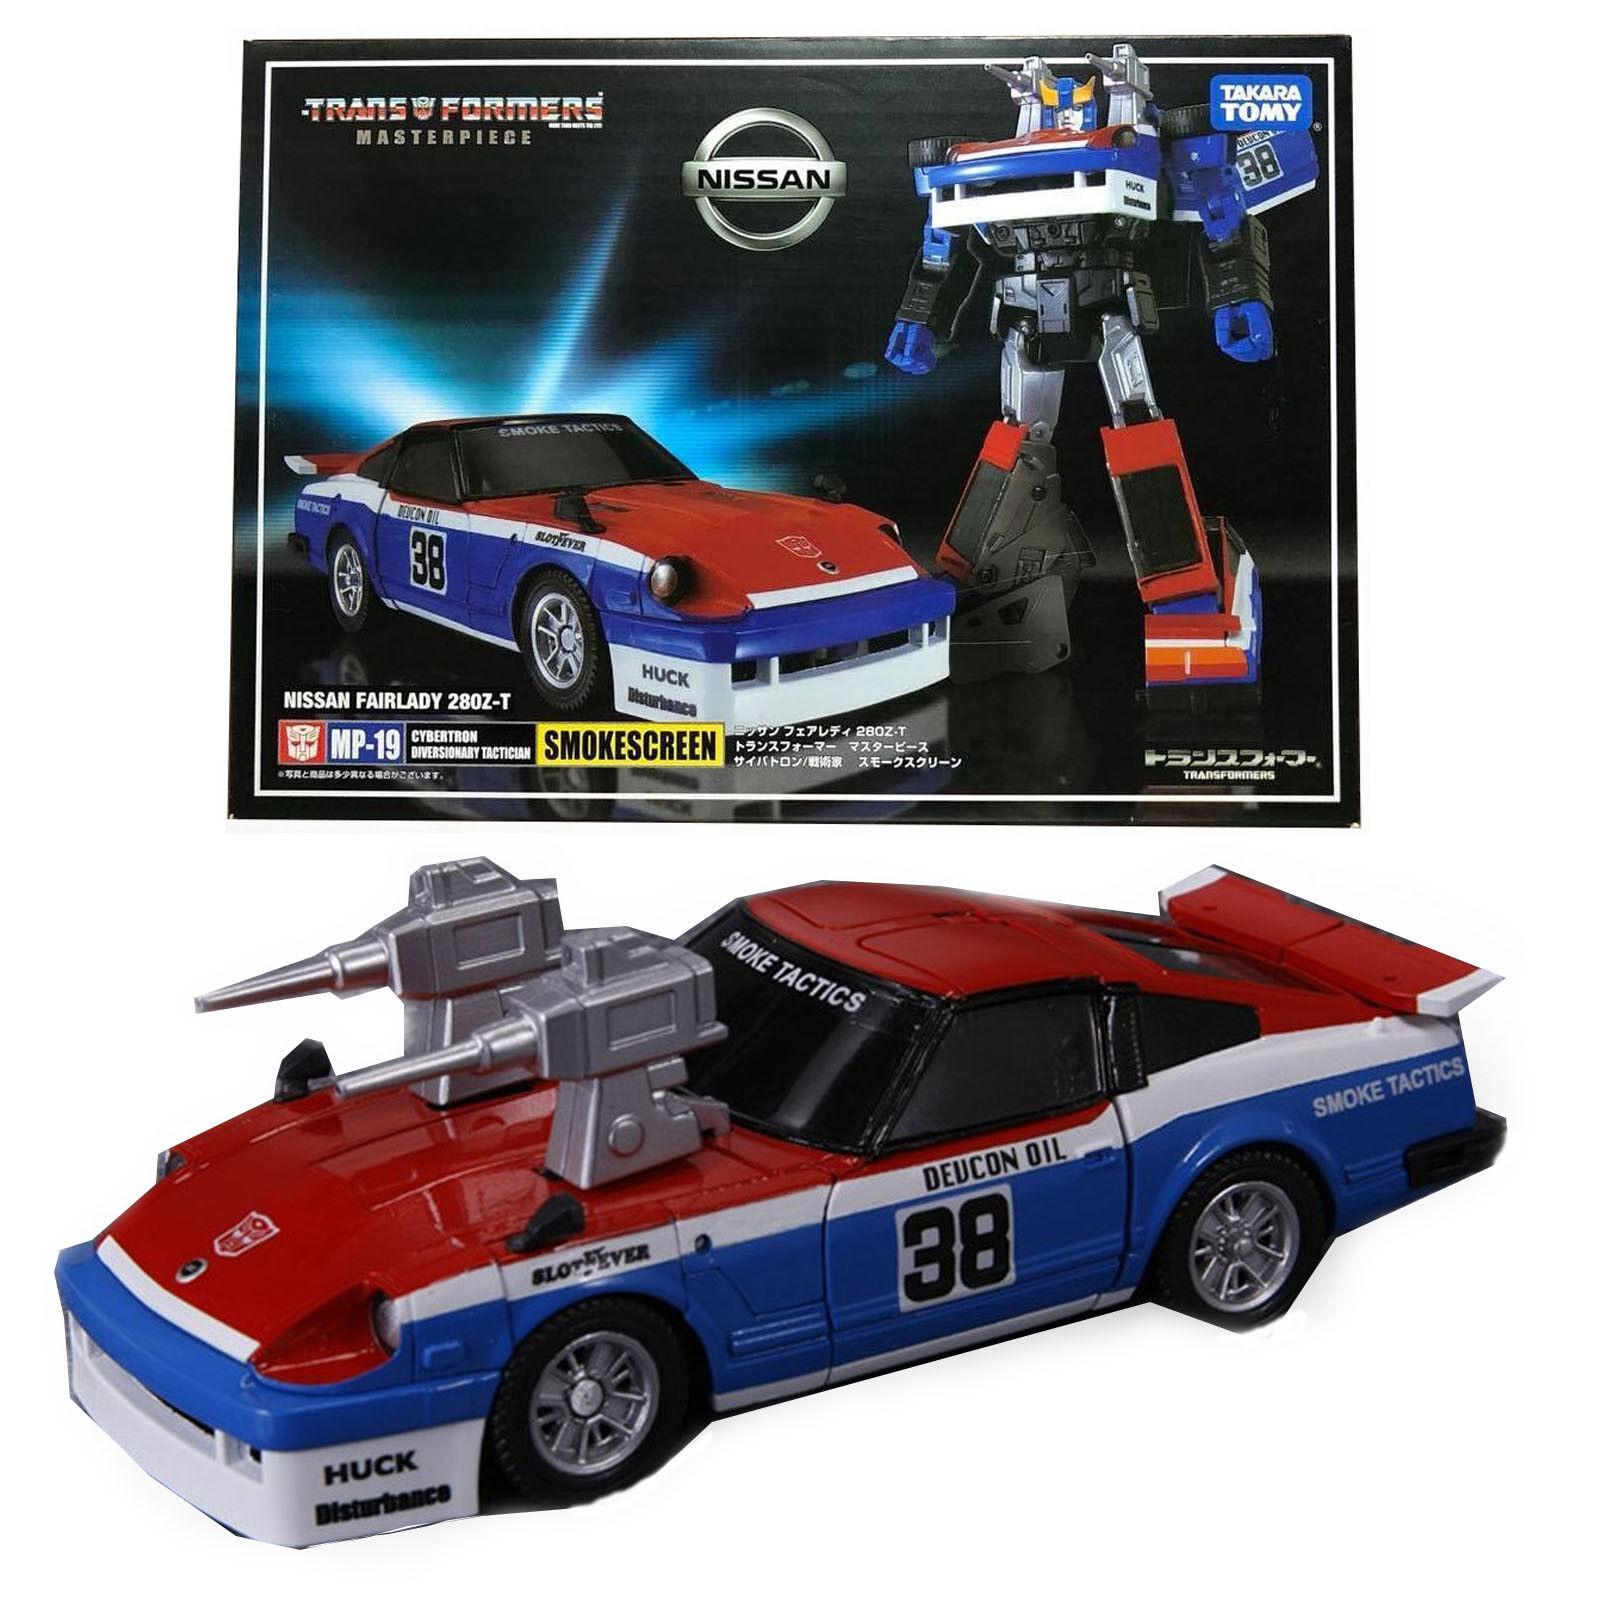 Transformers Masterpiece MP-19 MP19 SMOKESCREEN Autobots Action Figure Gift Kids